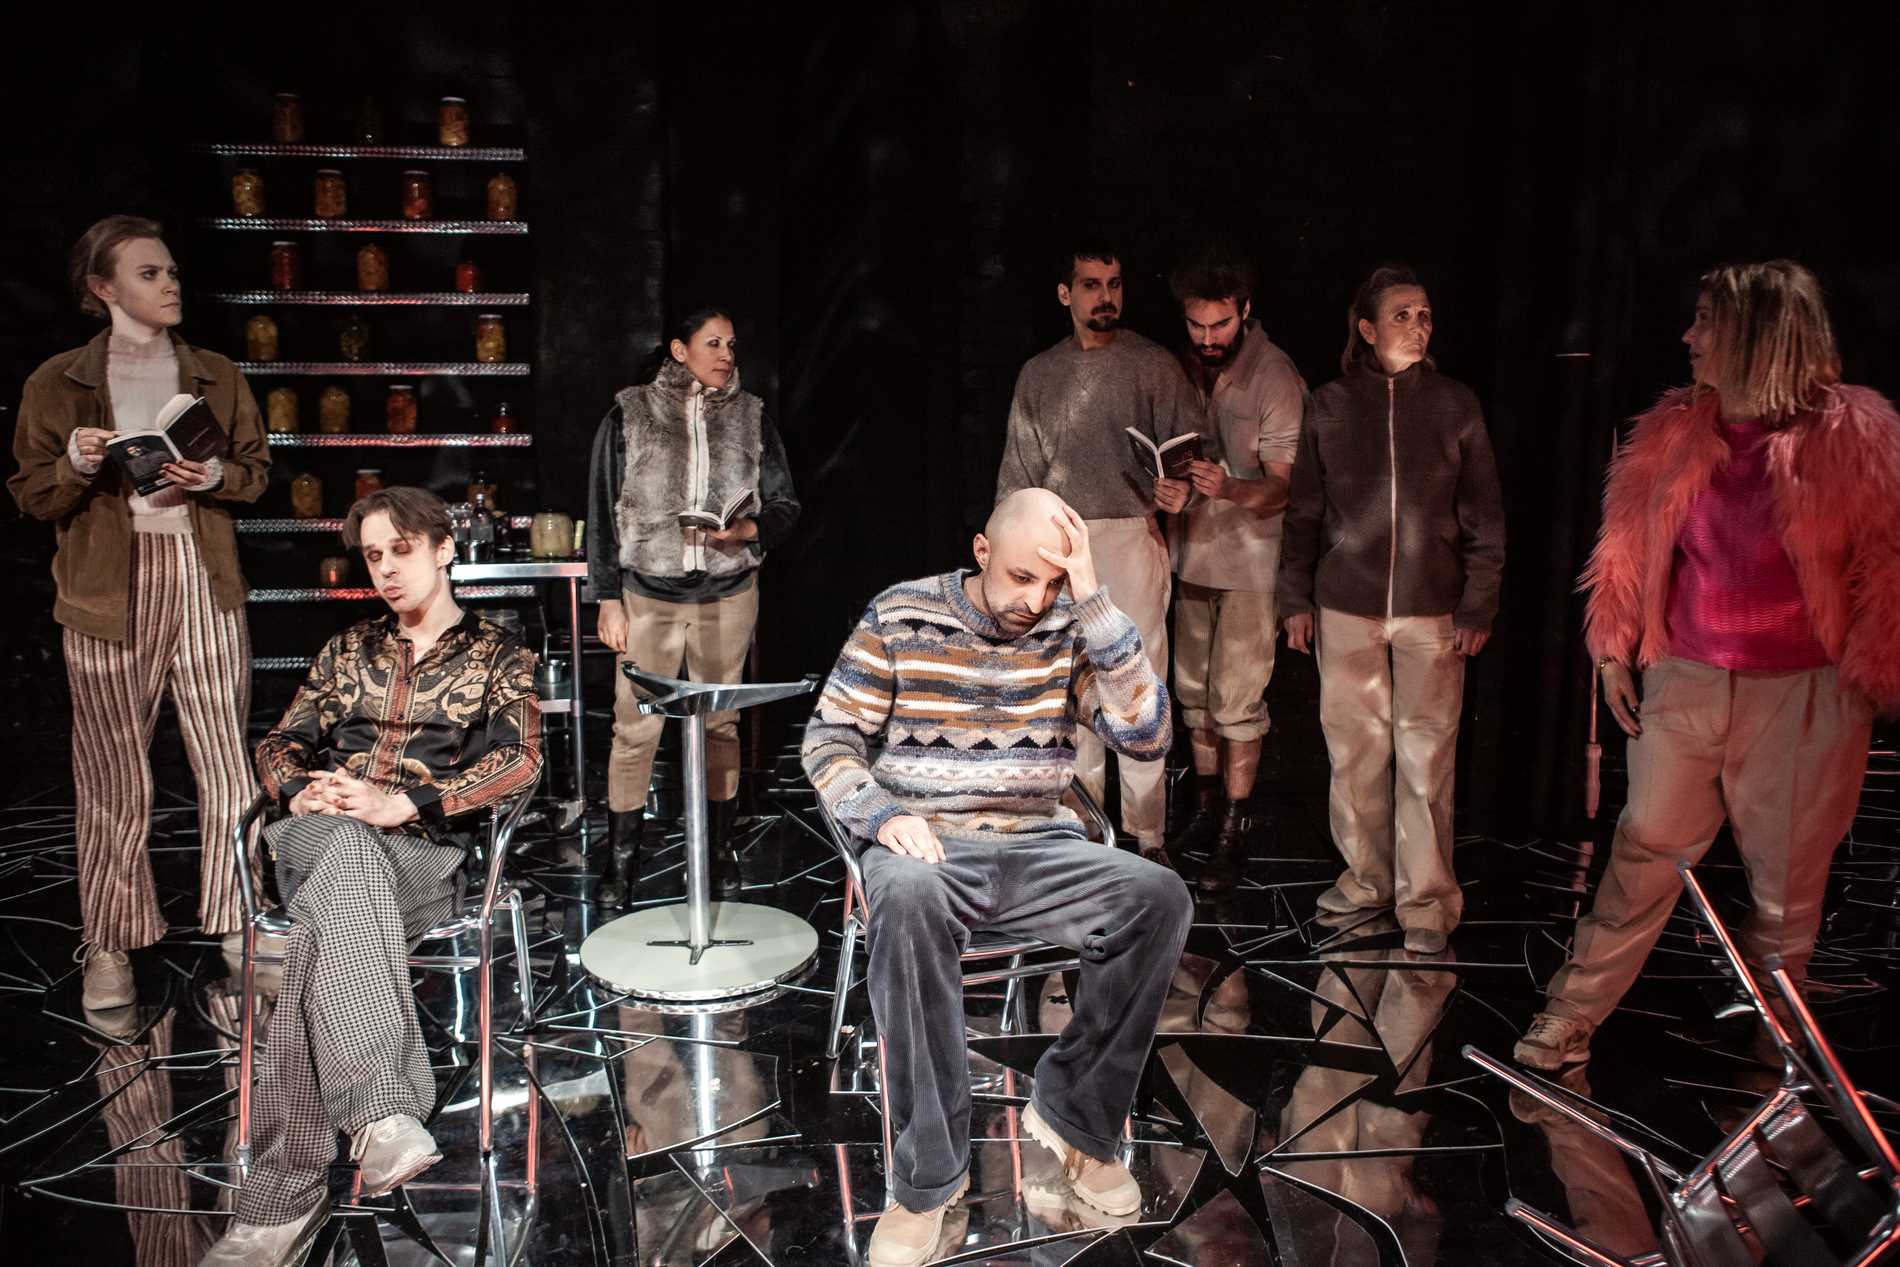 """Irakisk Kristus"" på Teater Galeasen ställs in på nytt. Pressbild."